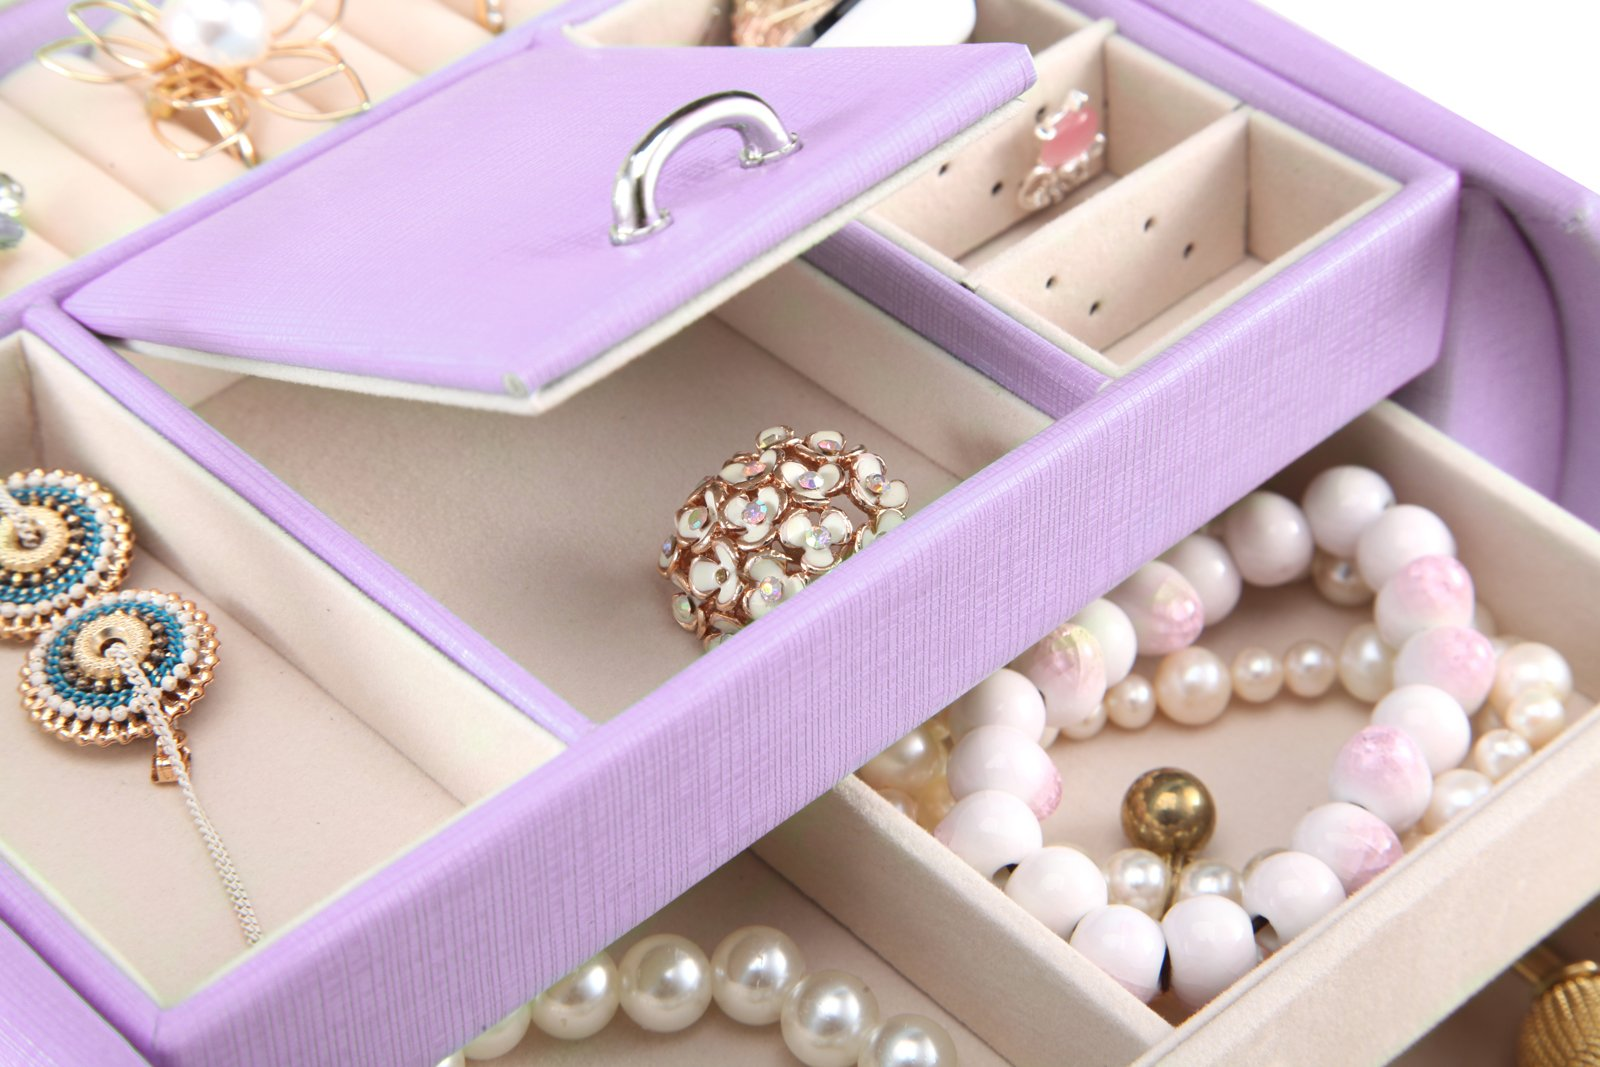 Vlando Princess Style Jewelry Box from Netherlands Design Team, Fabulous Christmas Gift for Girls (Purple) by Vlando (Image #3)